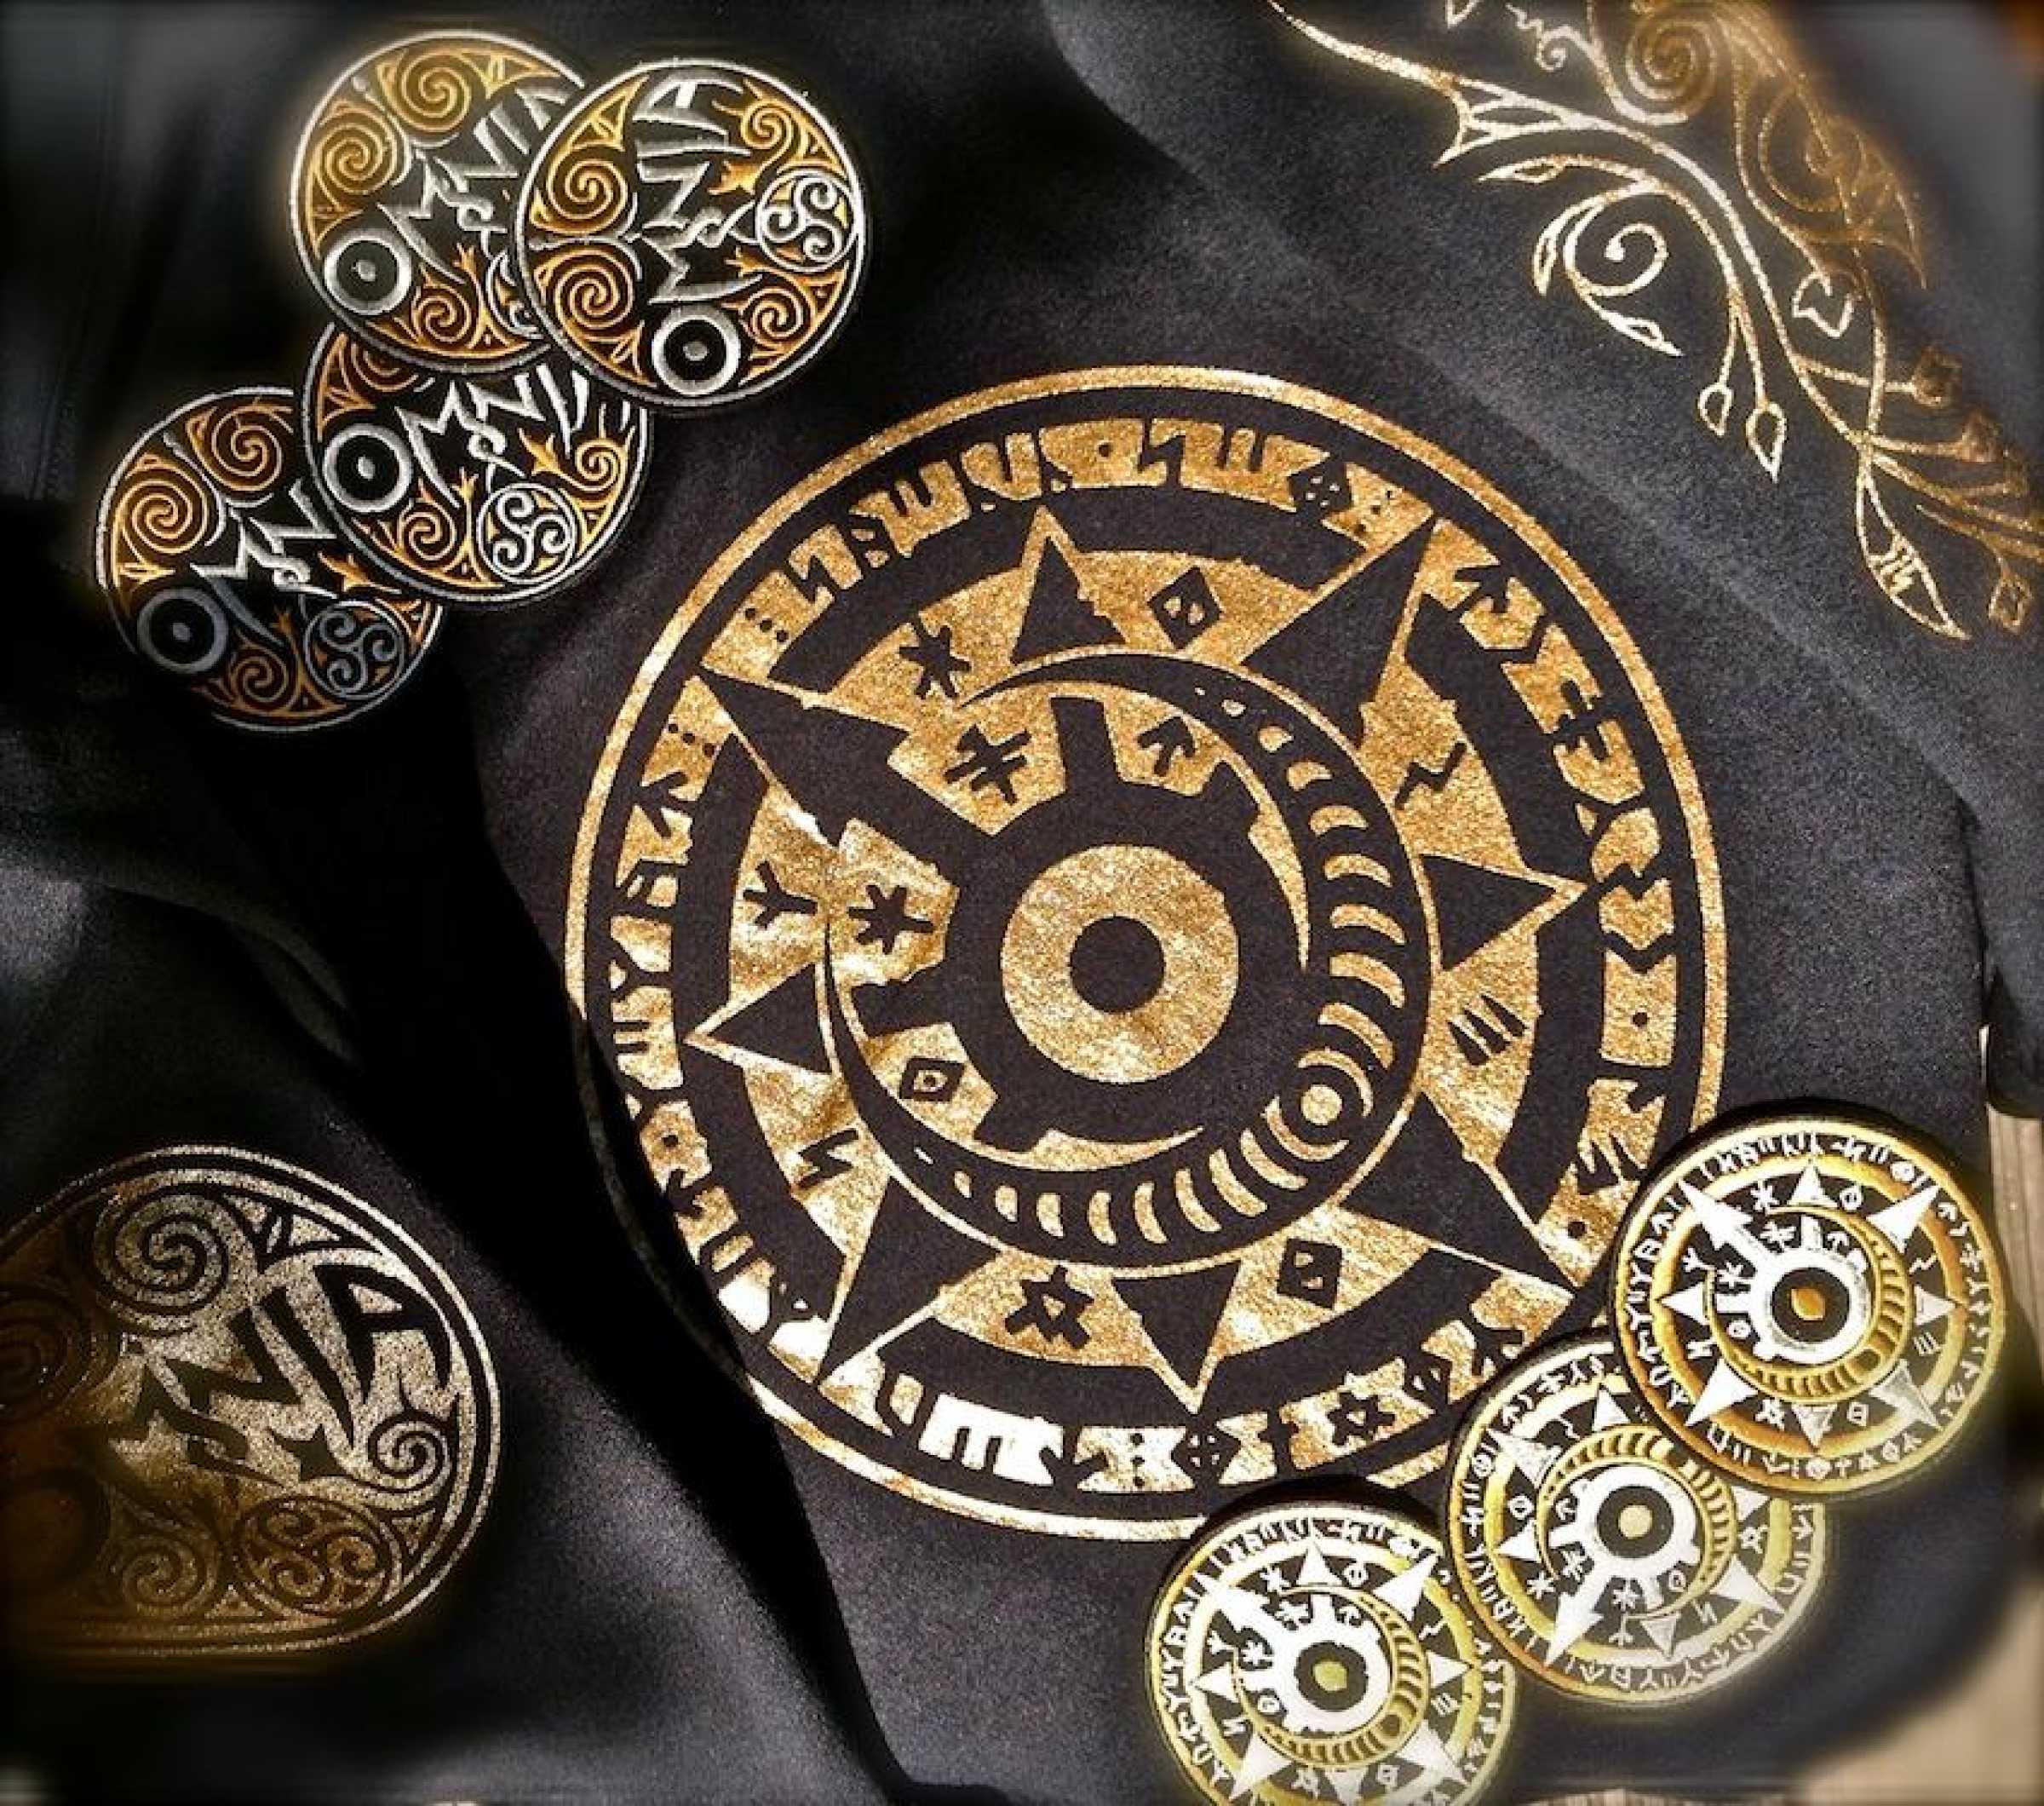 New Pagan Merchandise World Of Omnia